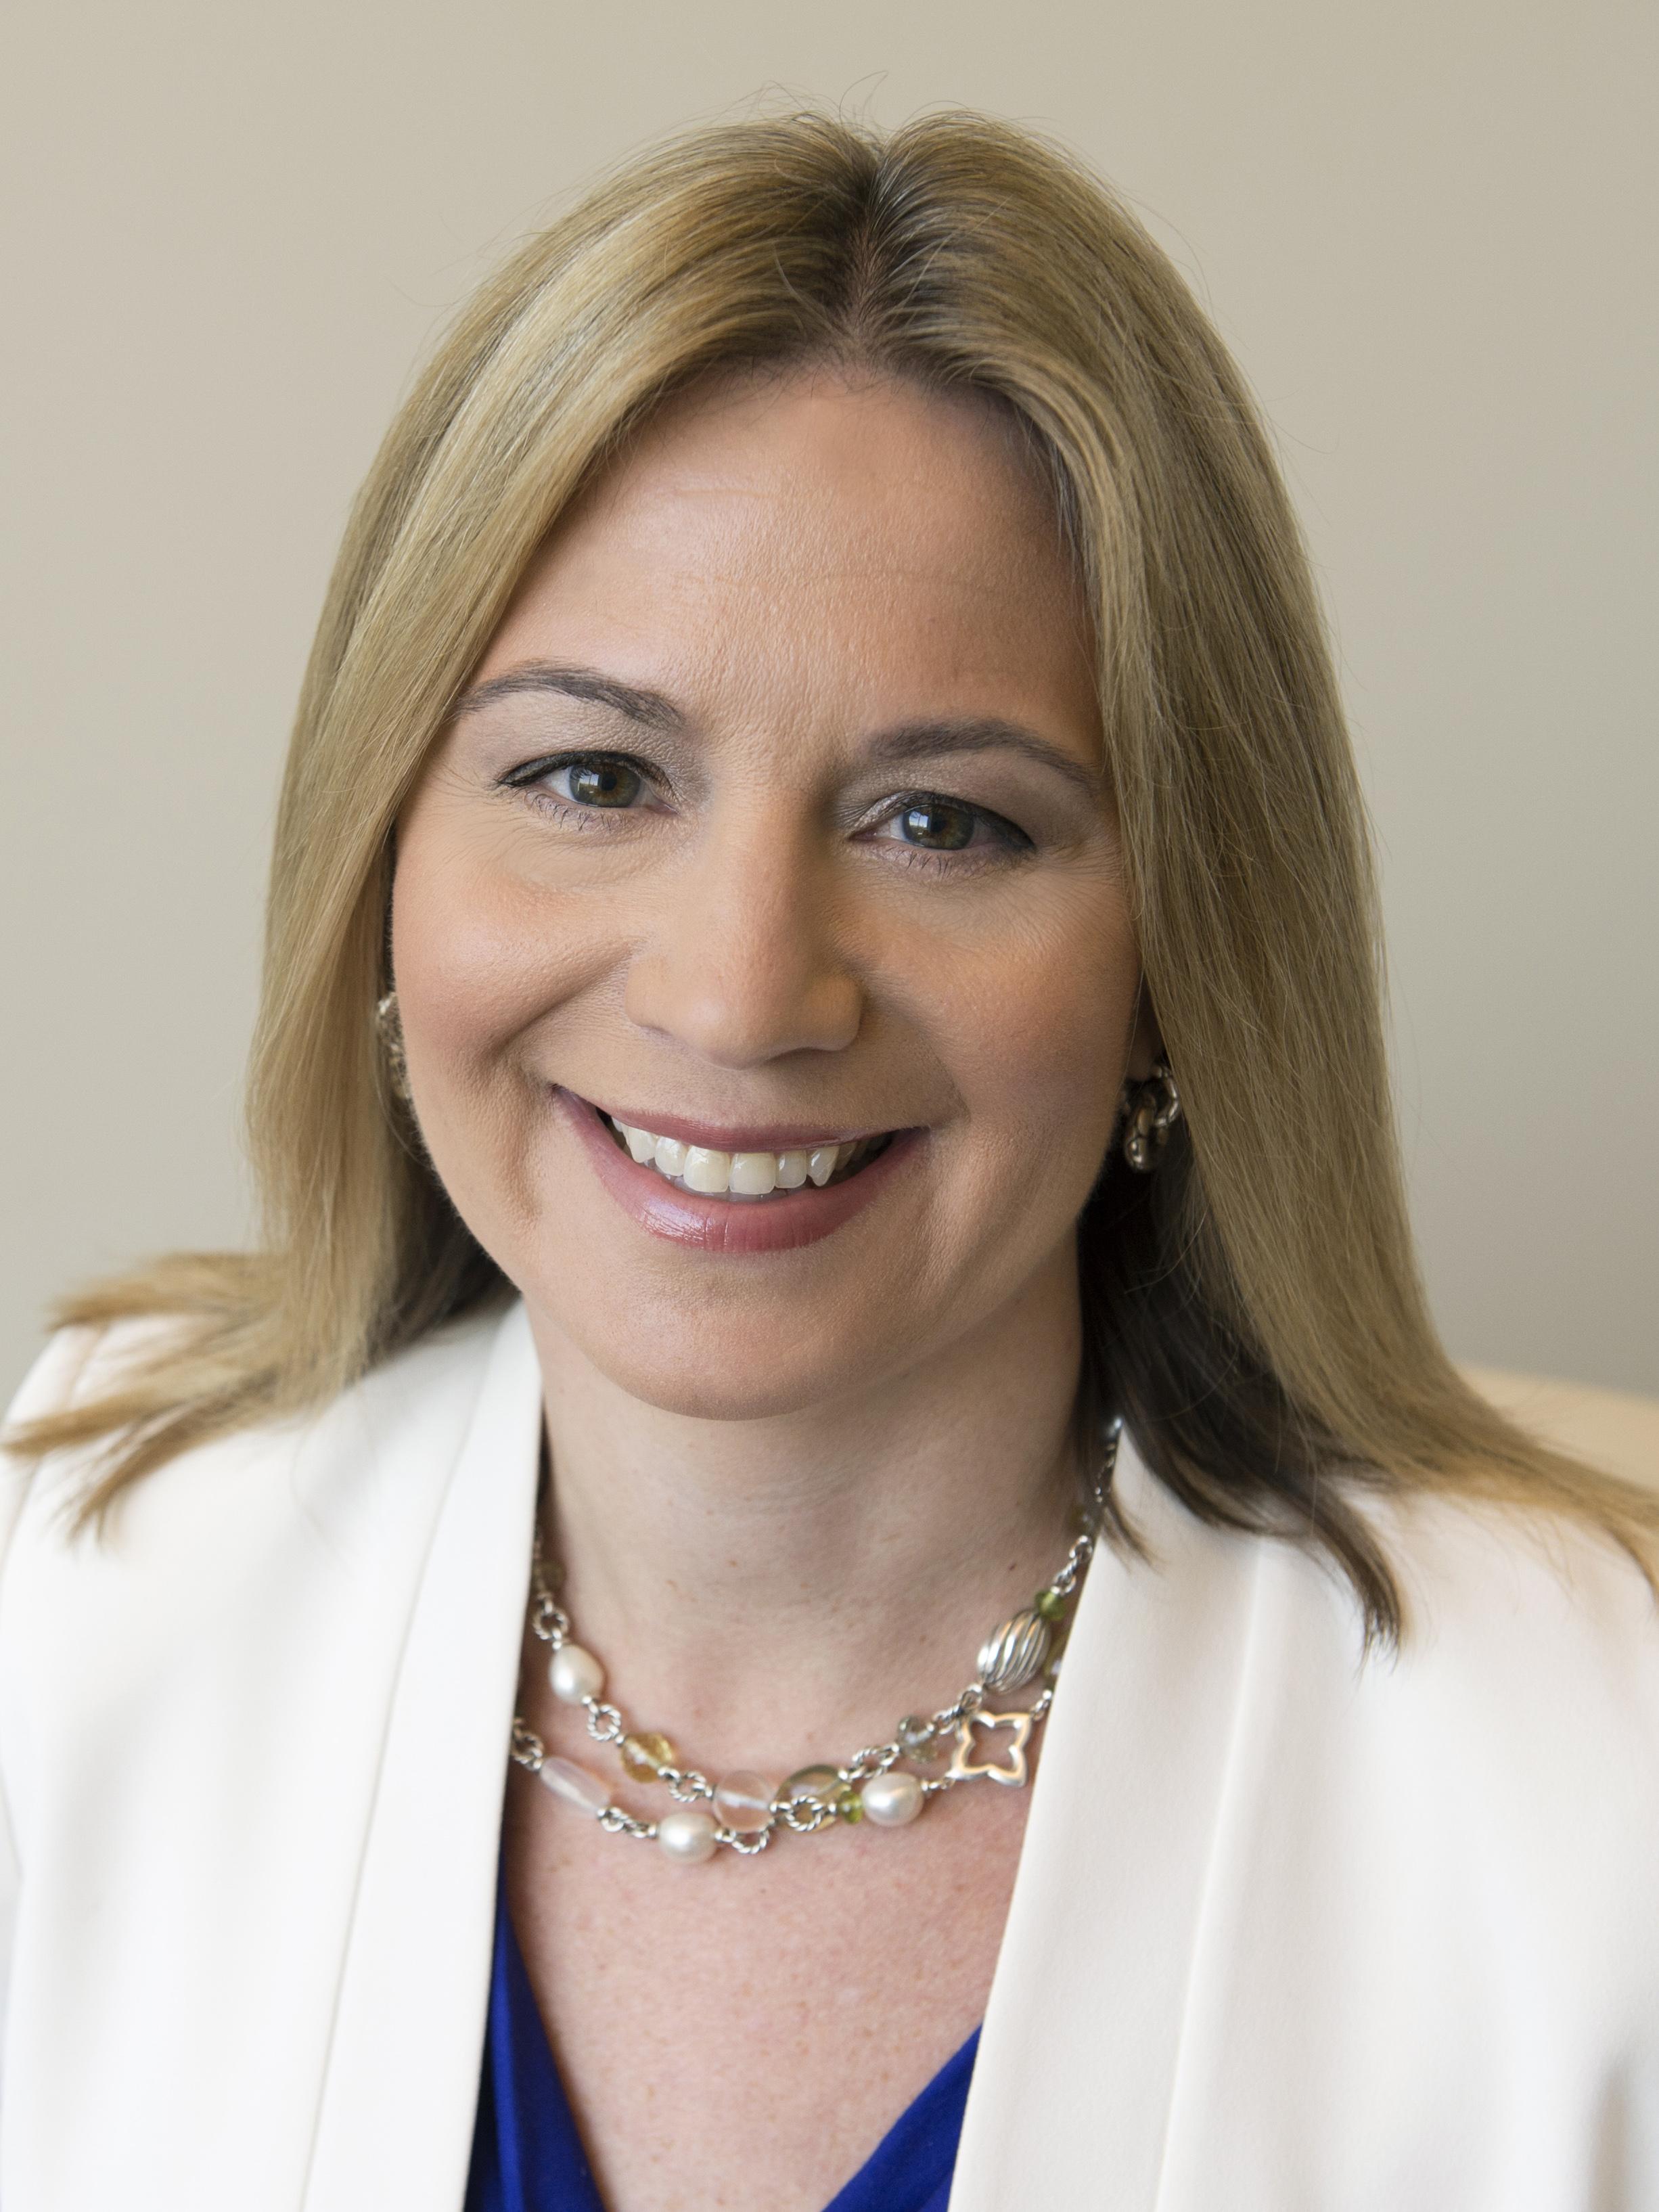 Valerie Nichol